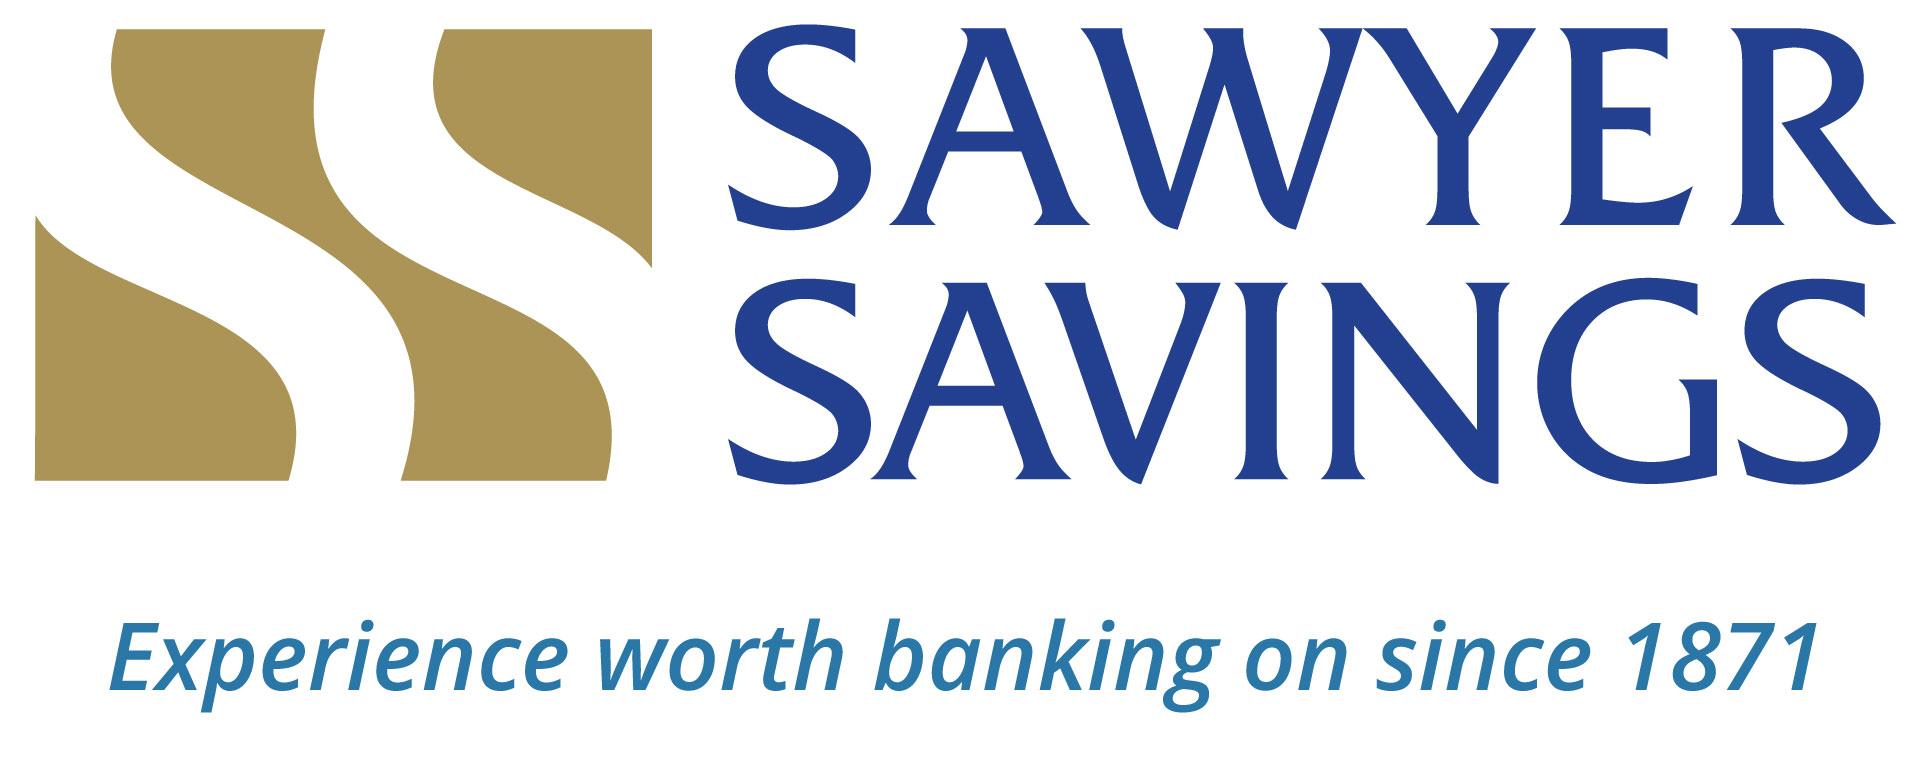 SawyerSavingsLogo